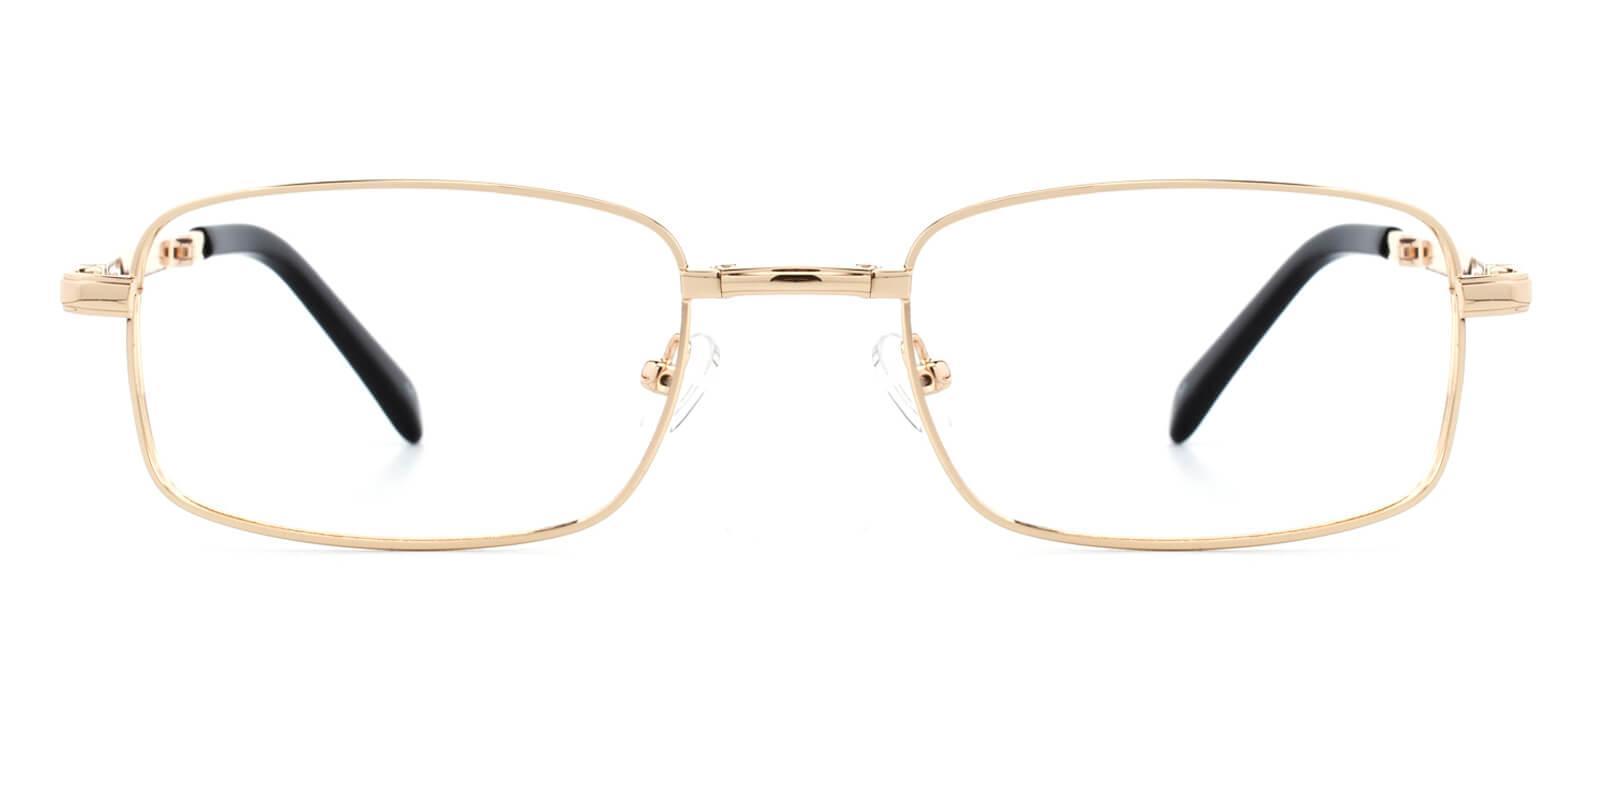 Norfolk-Gold-Rectangle-Metal-Eyeglasses-additional2